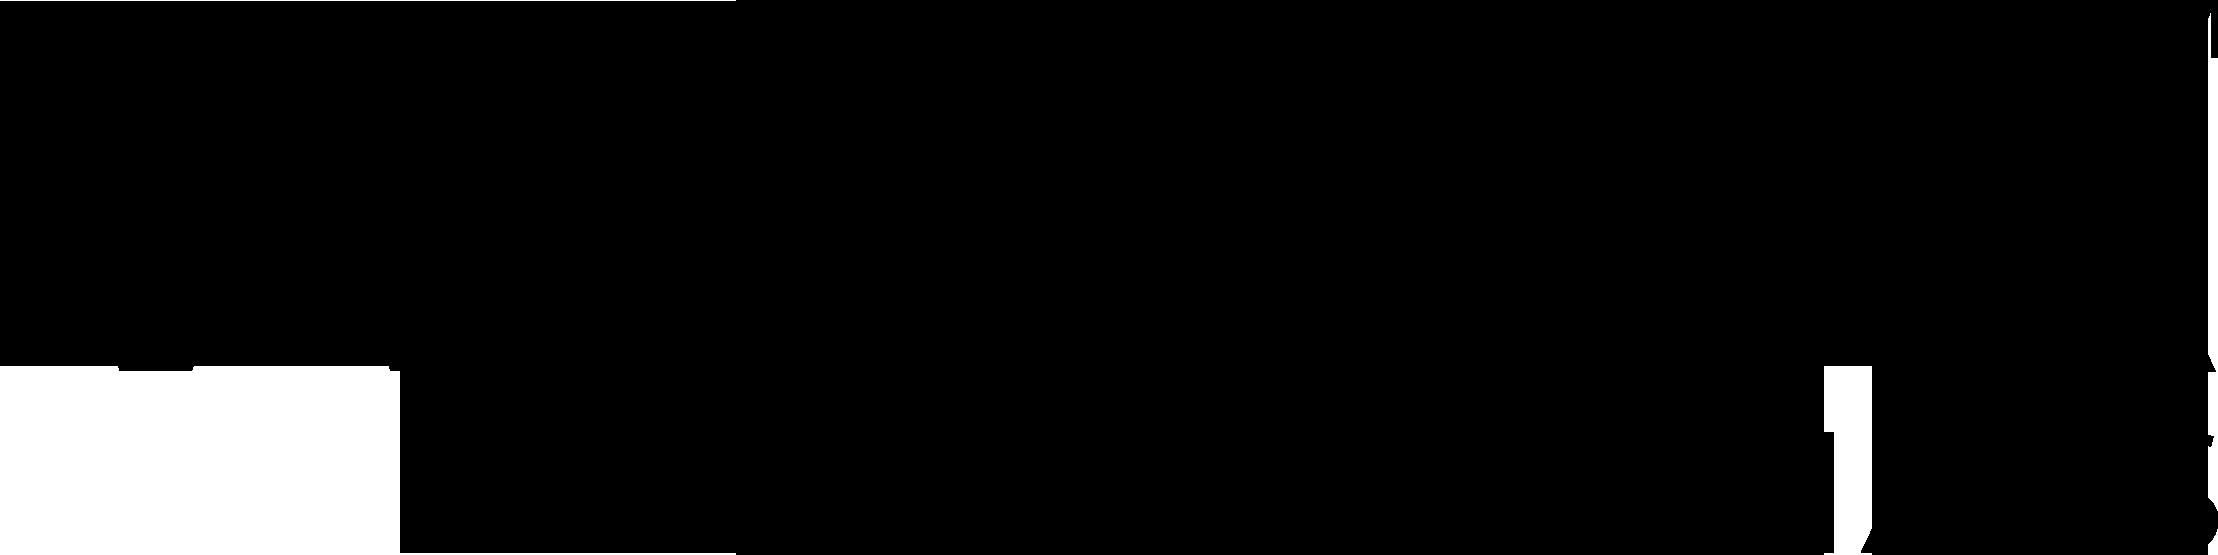 Wella_black_logo.png